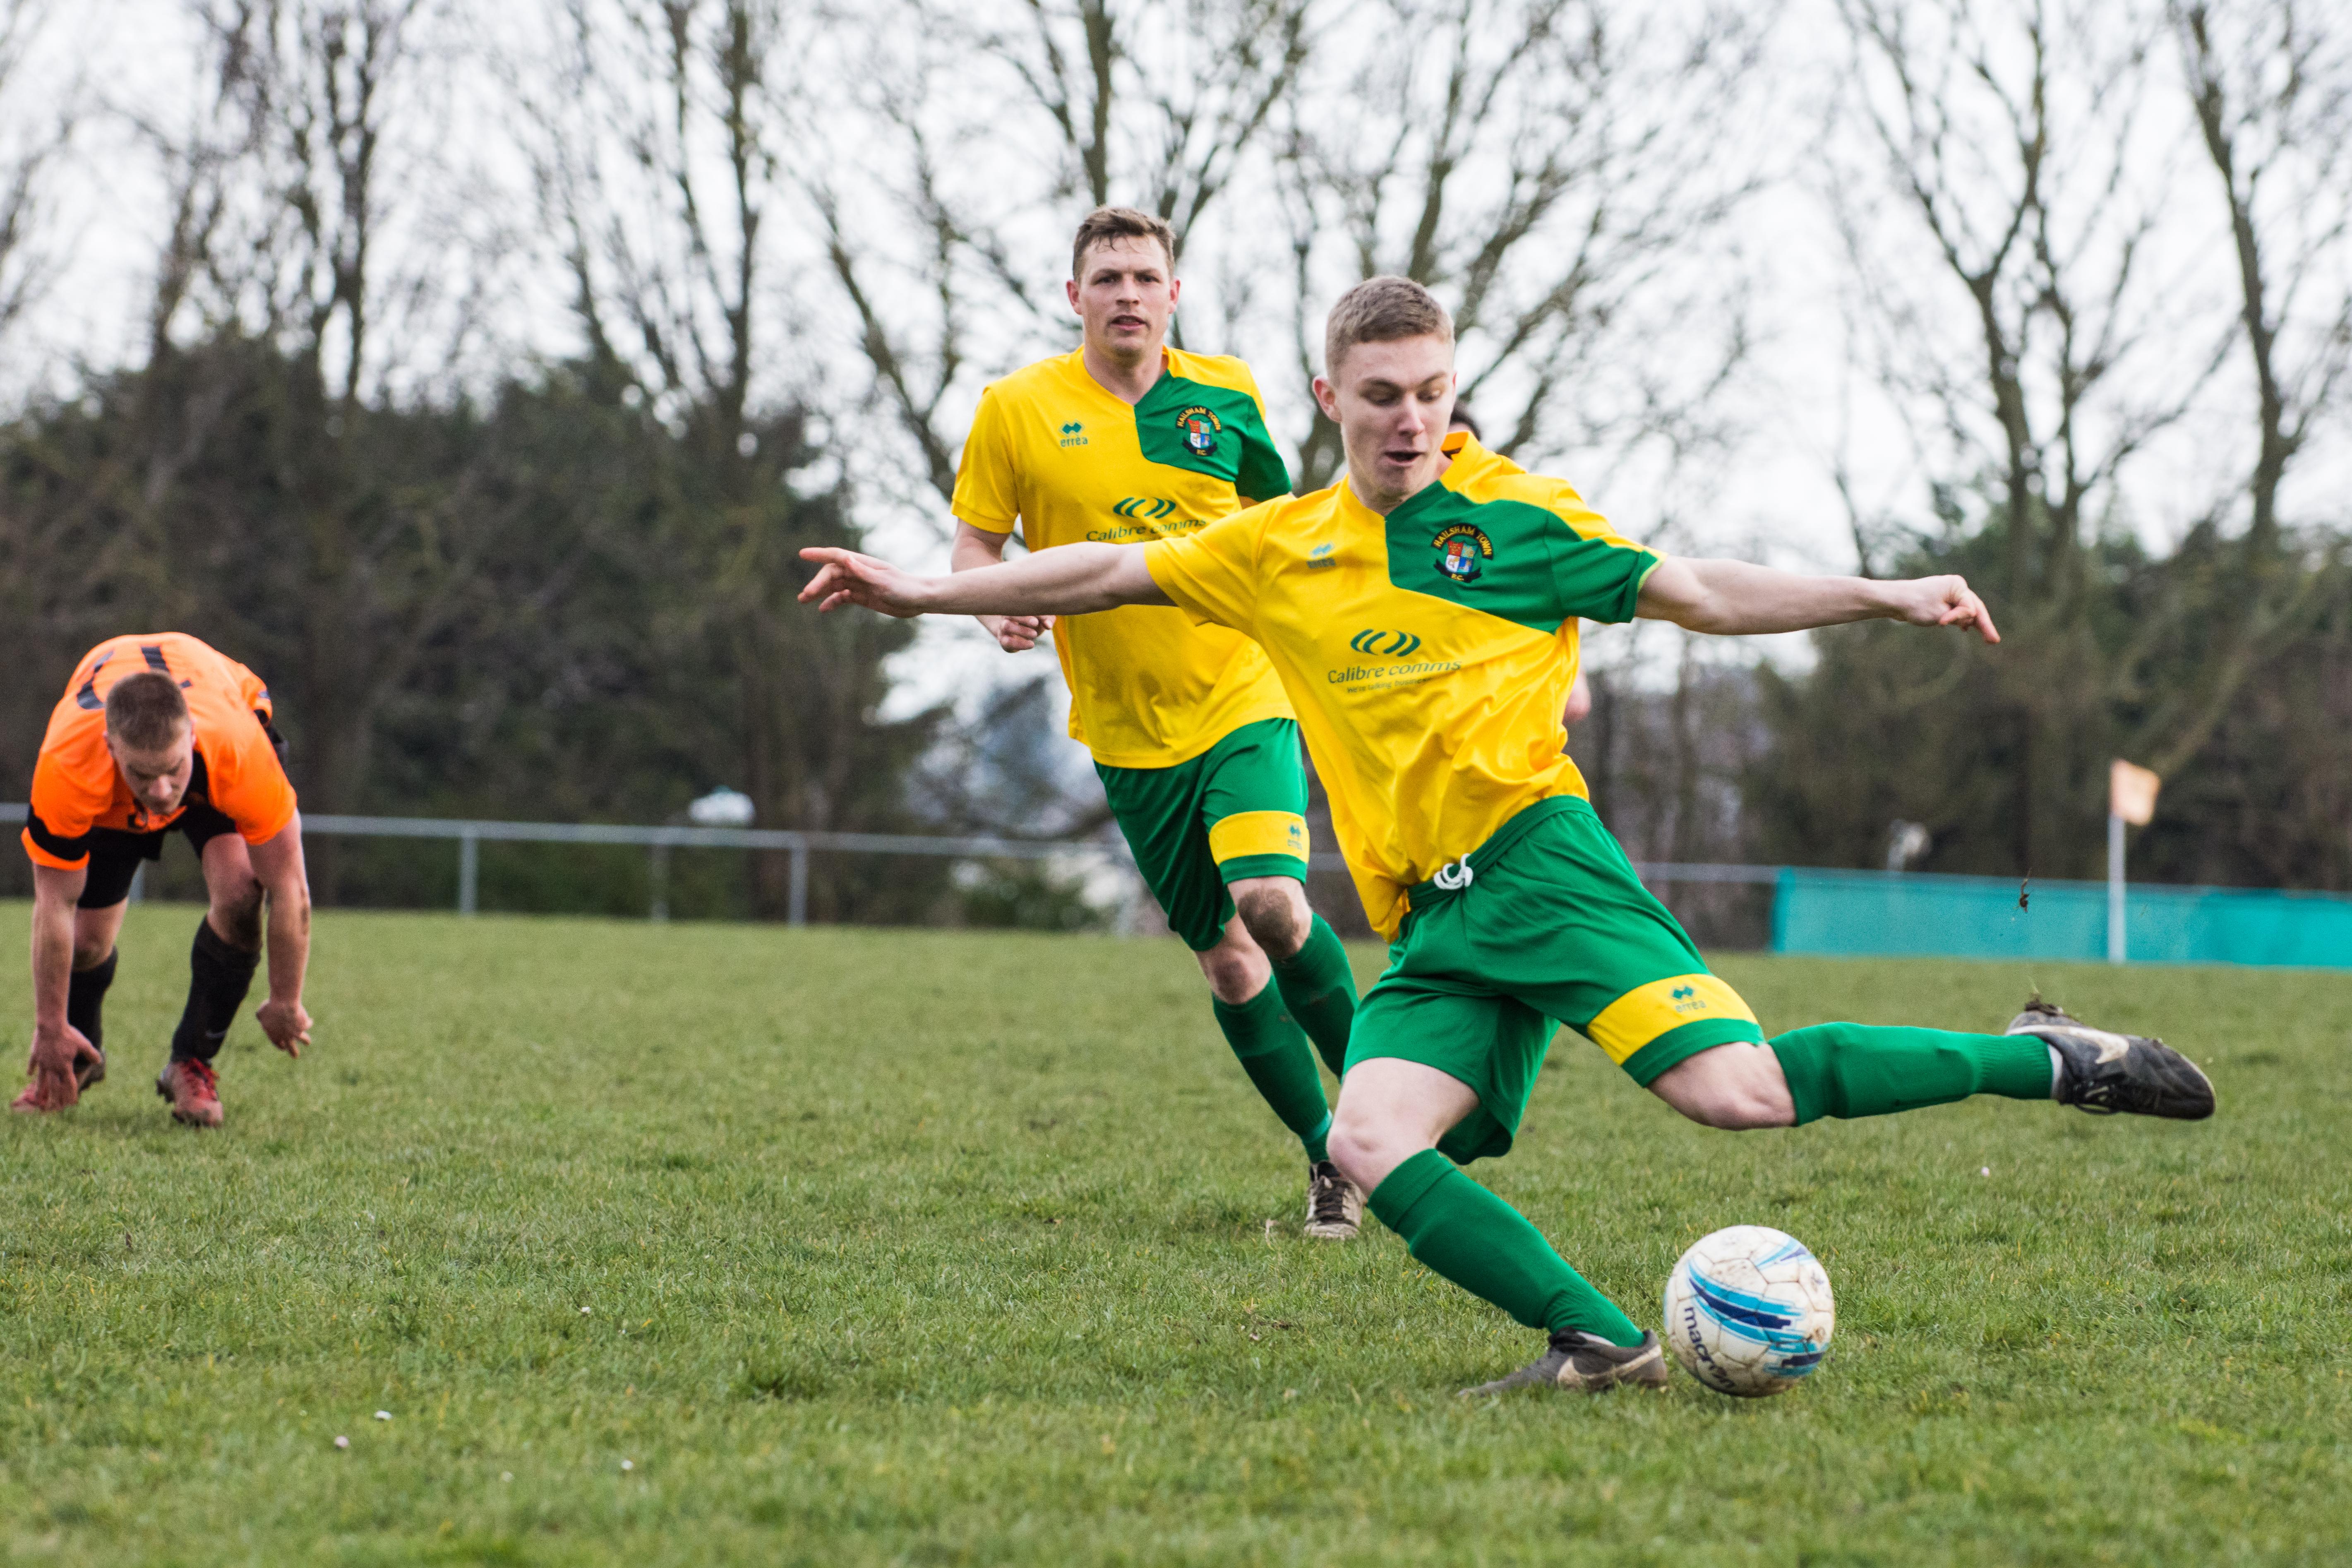 DAVID_JEFFERY Mile Oak FC vs Hailsham Town FC 24.03.18 84